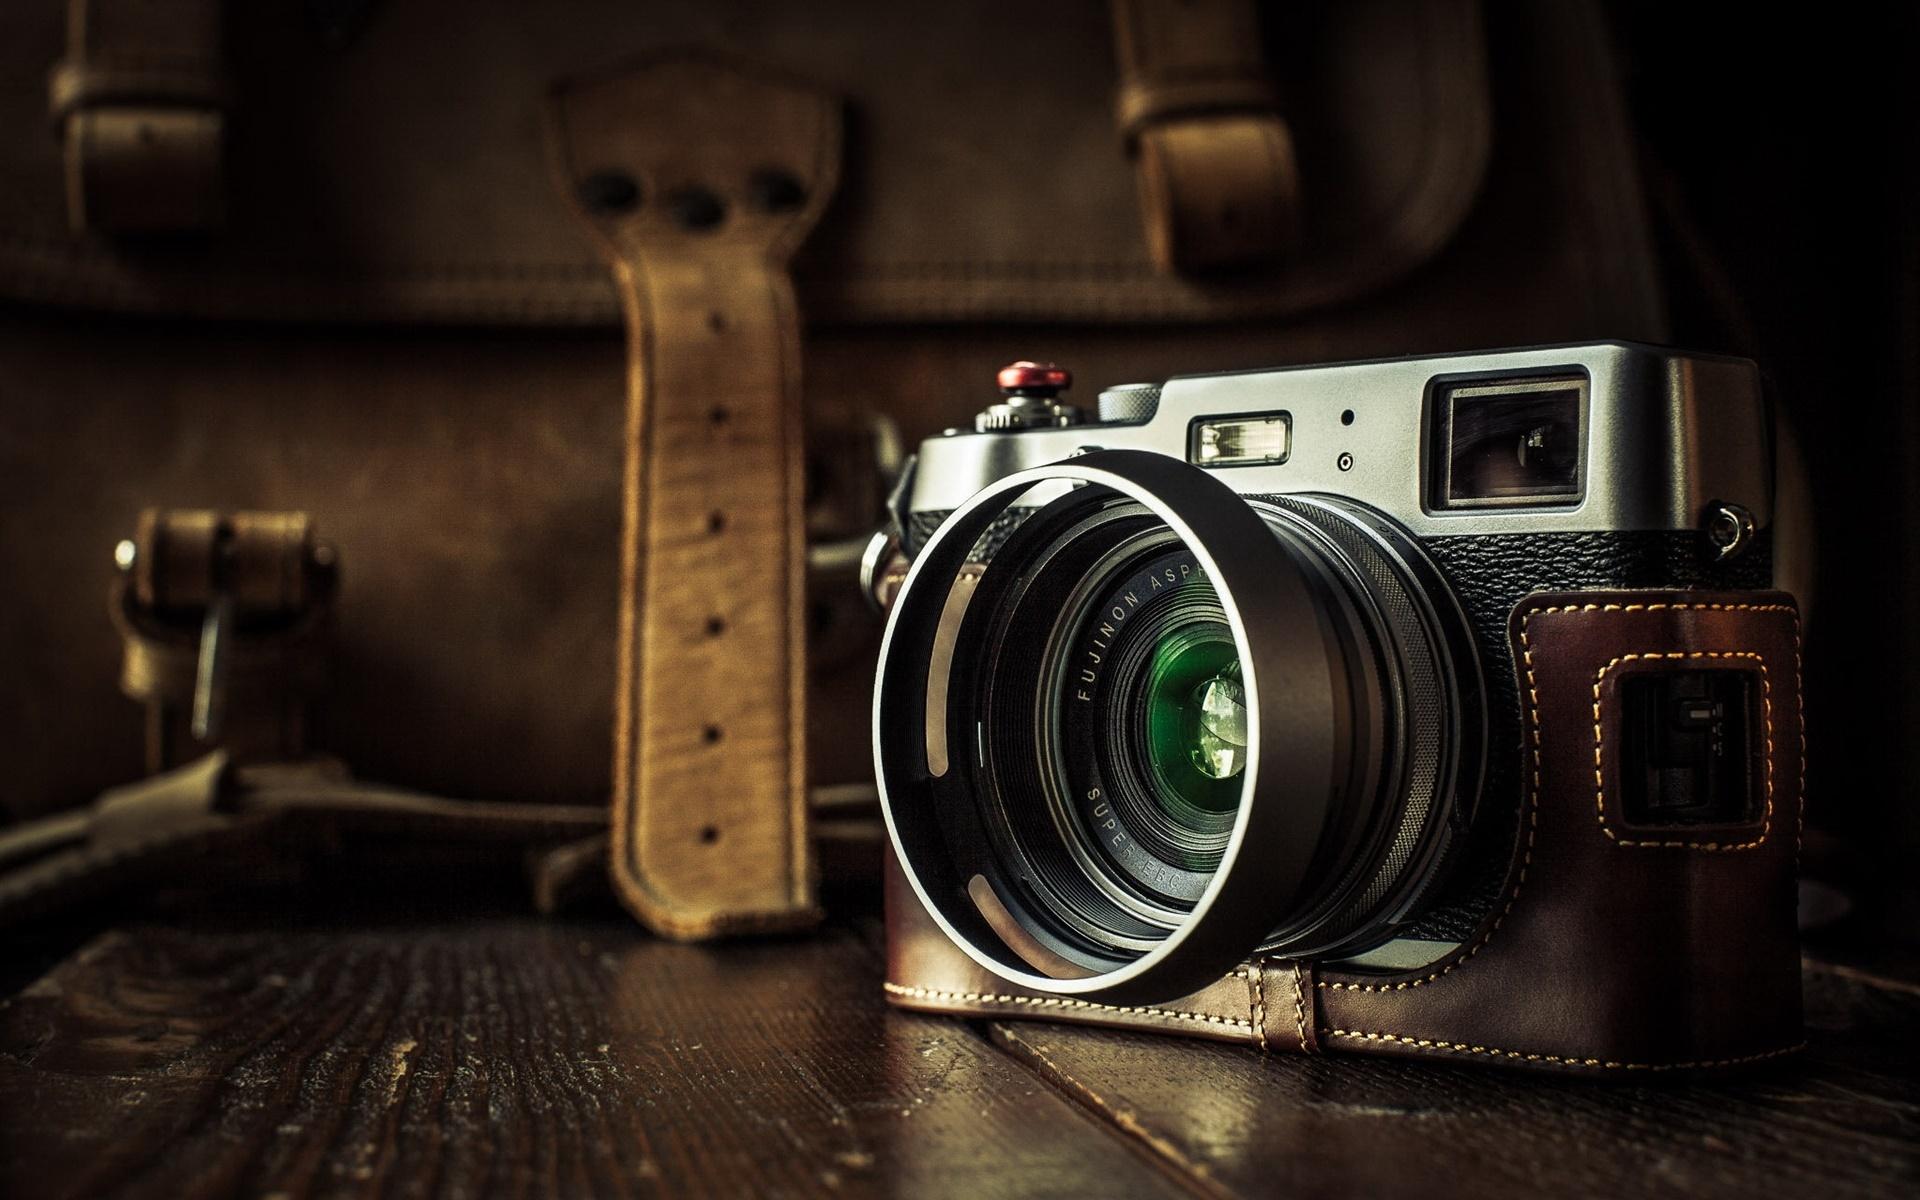 Appareil photo fuji x100t num rique fonds d 39 cran for Ecran appareil photo